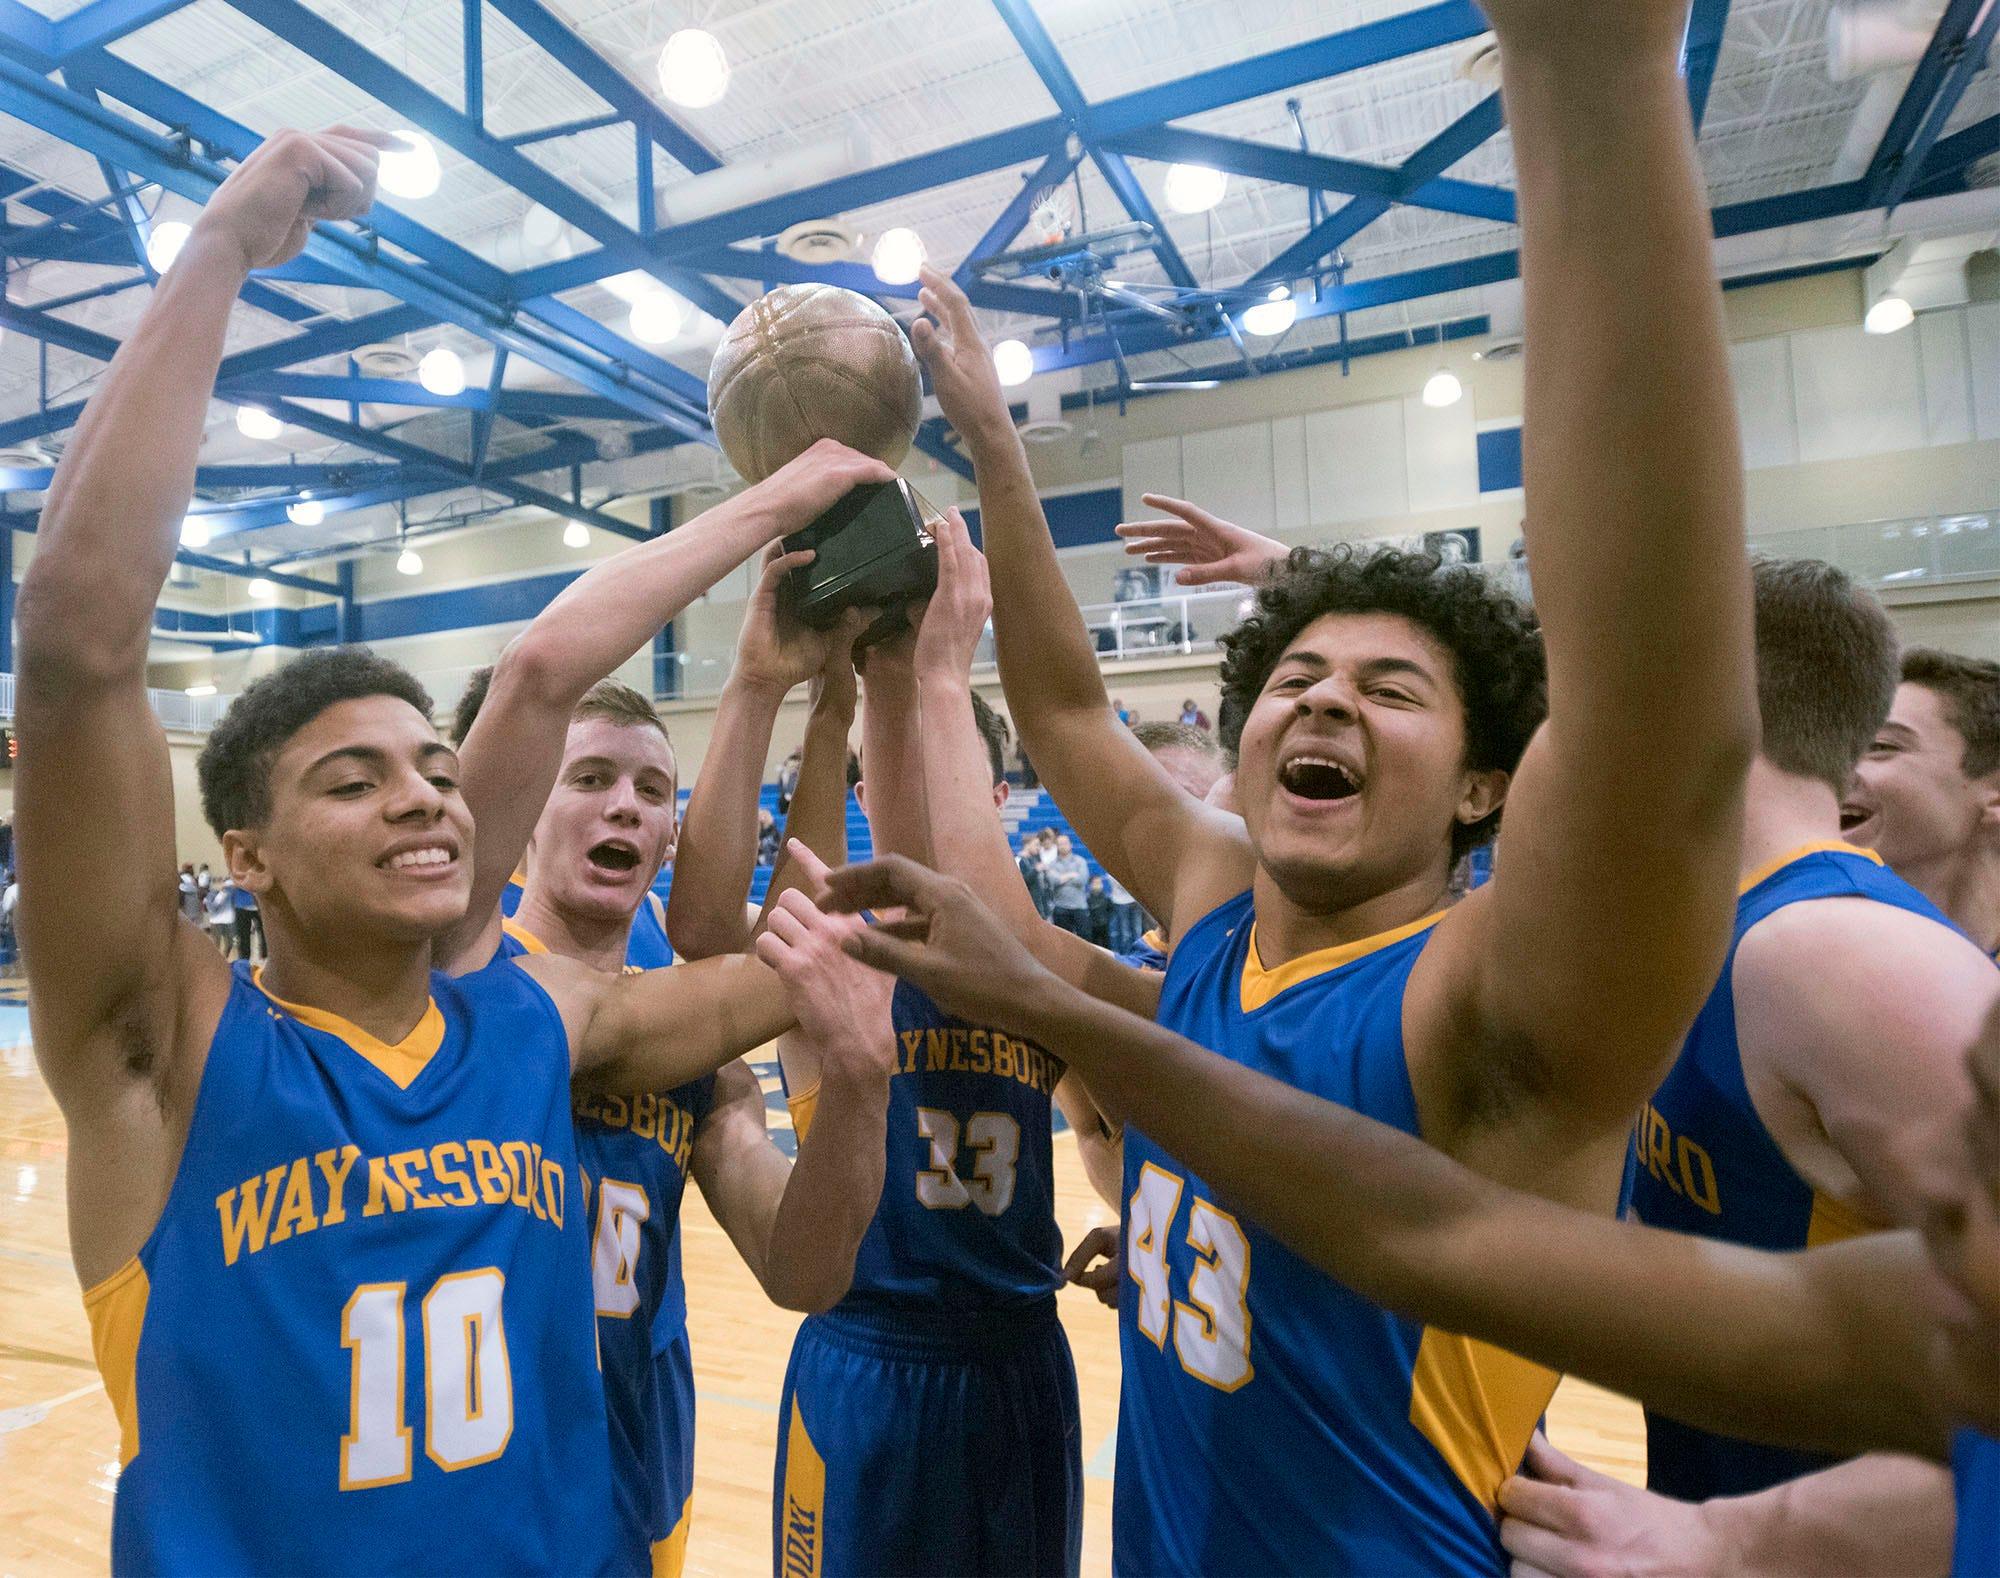 Cpo Mwd 120818 Waynesboro Cashs Boys Basketball